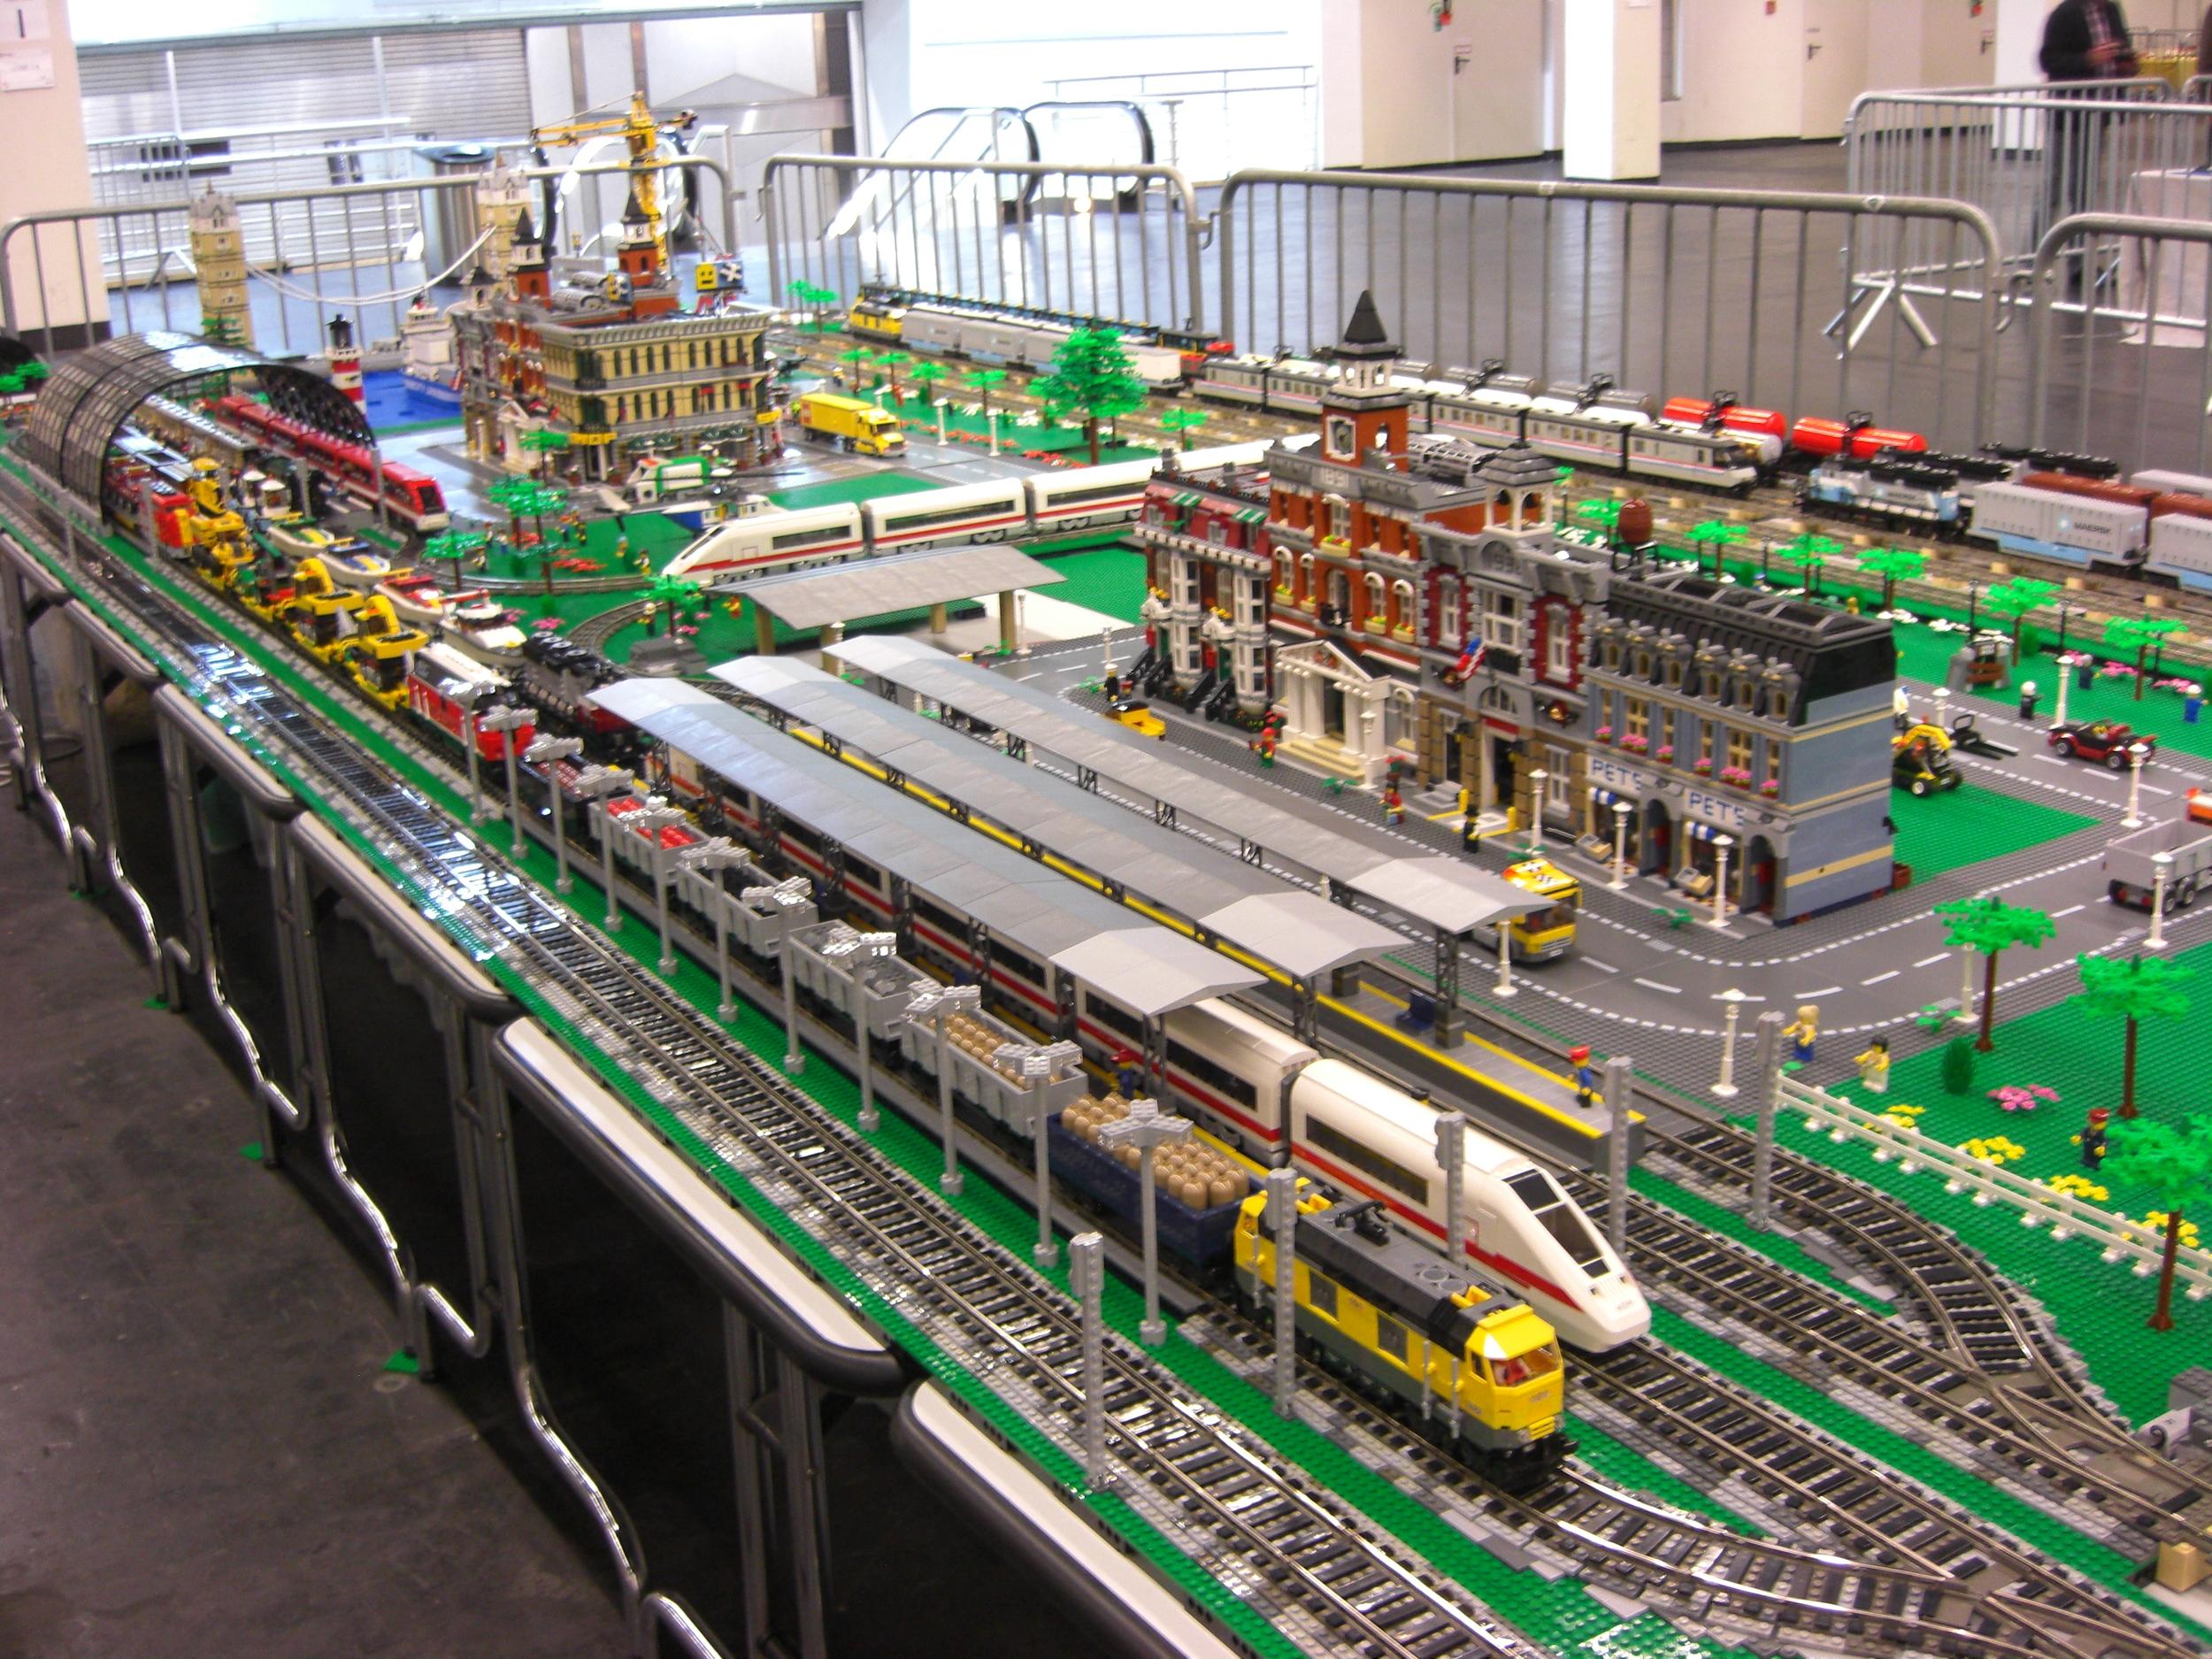 My LEGO train layout at Fanwelt 2012